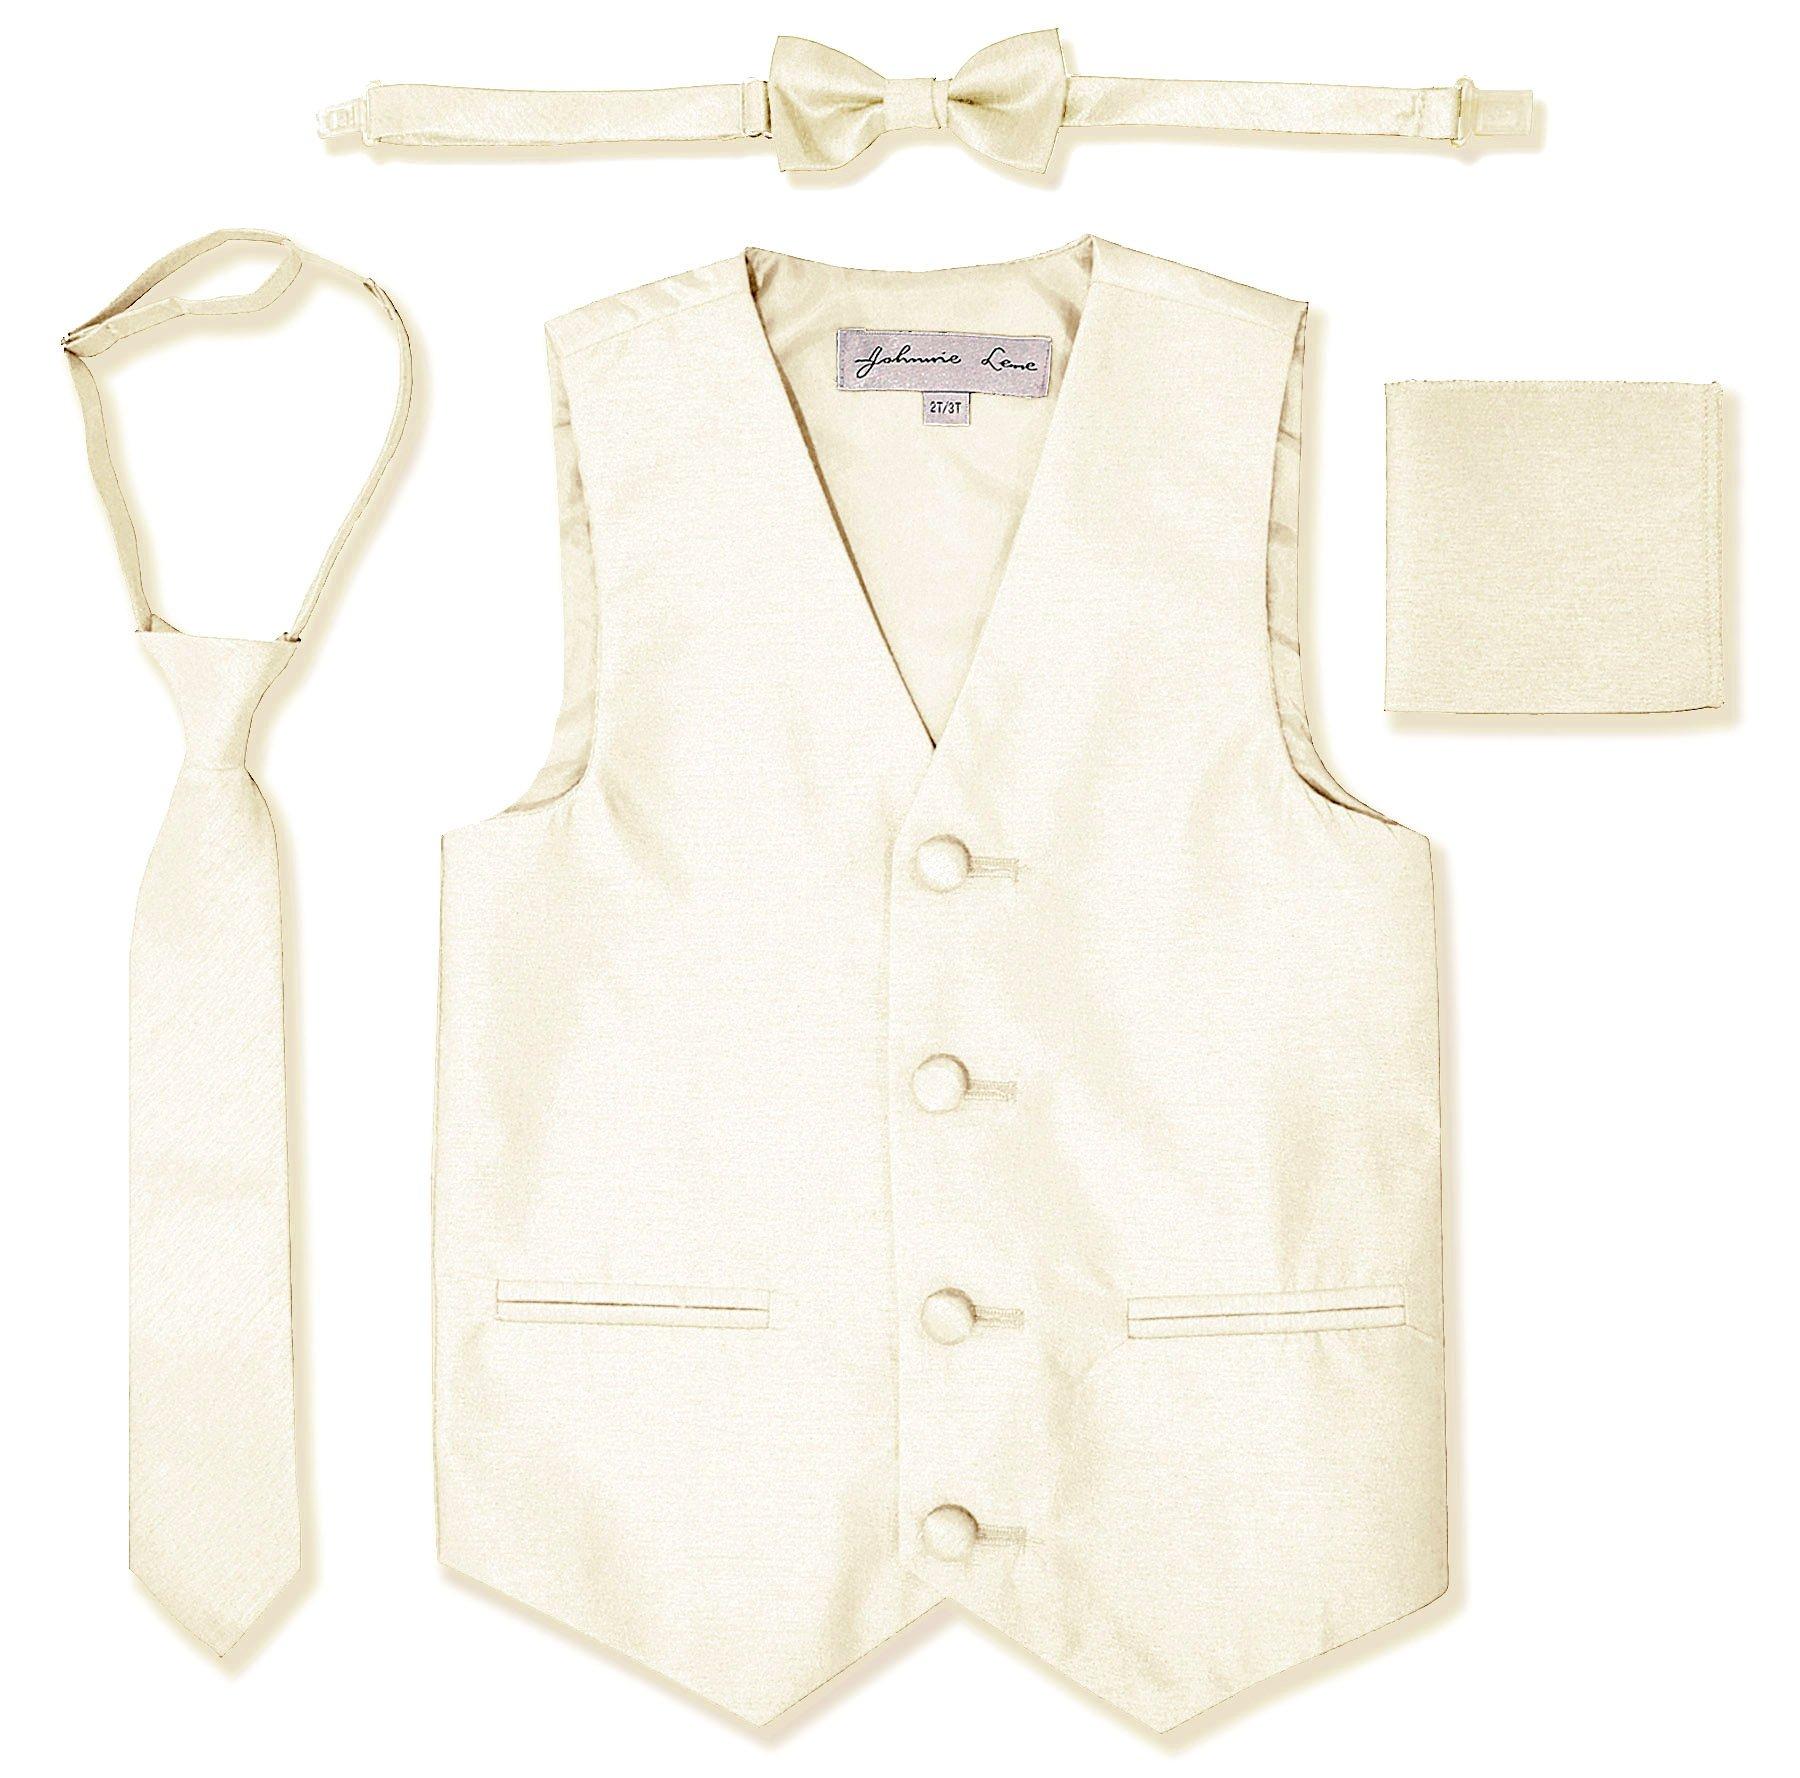 JL34 Boys Formal Tuxedo Vest Set (6/12 Months, Ivory) by Johnnie Lene (Image #1)